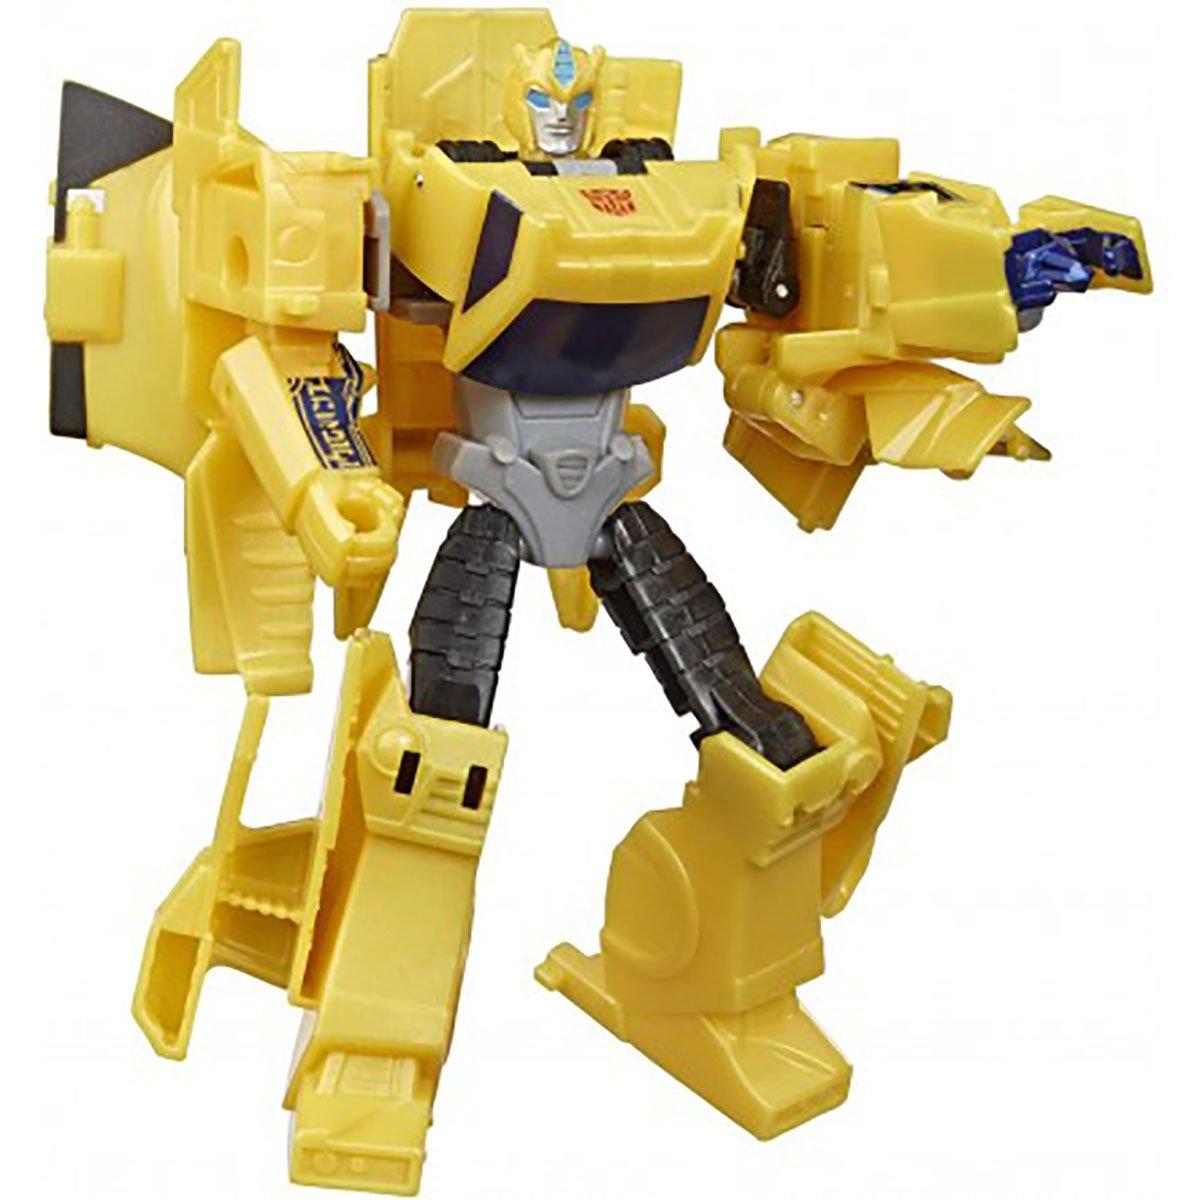 Figurina Transformers Cyberverse Action Attackers Warrior, Bumblebee E7084